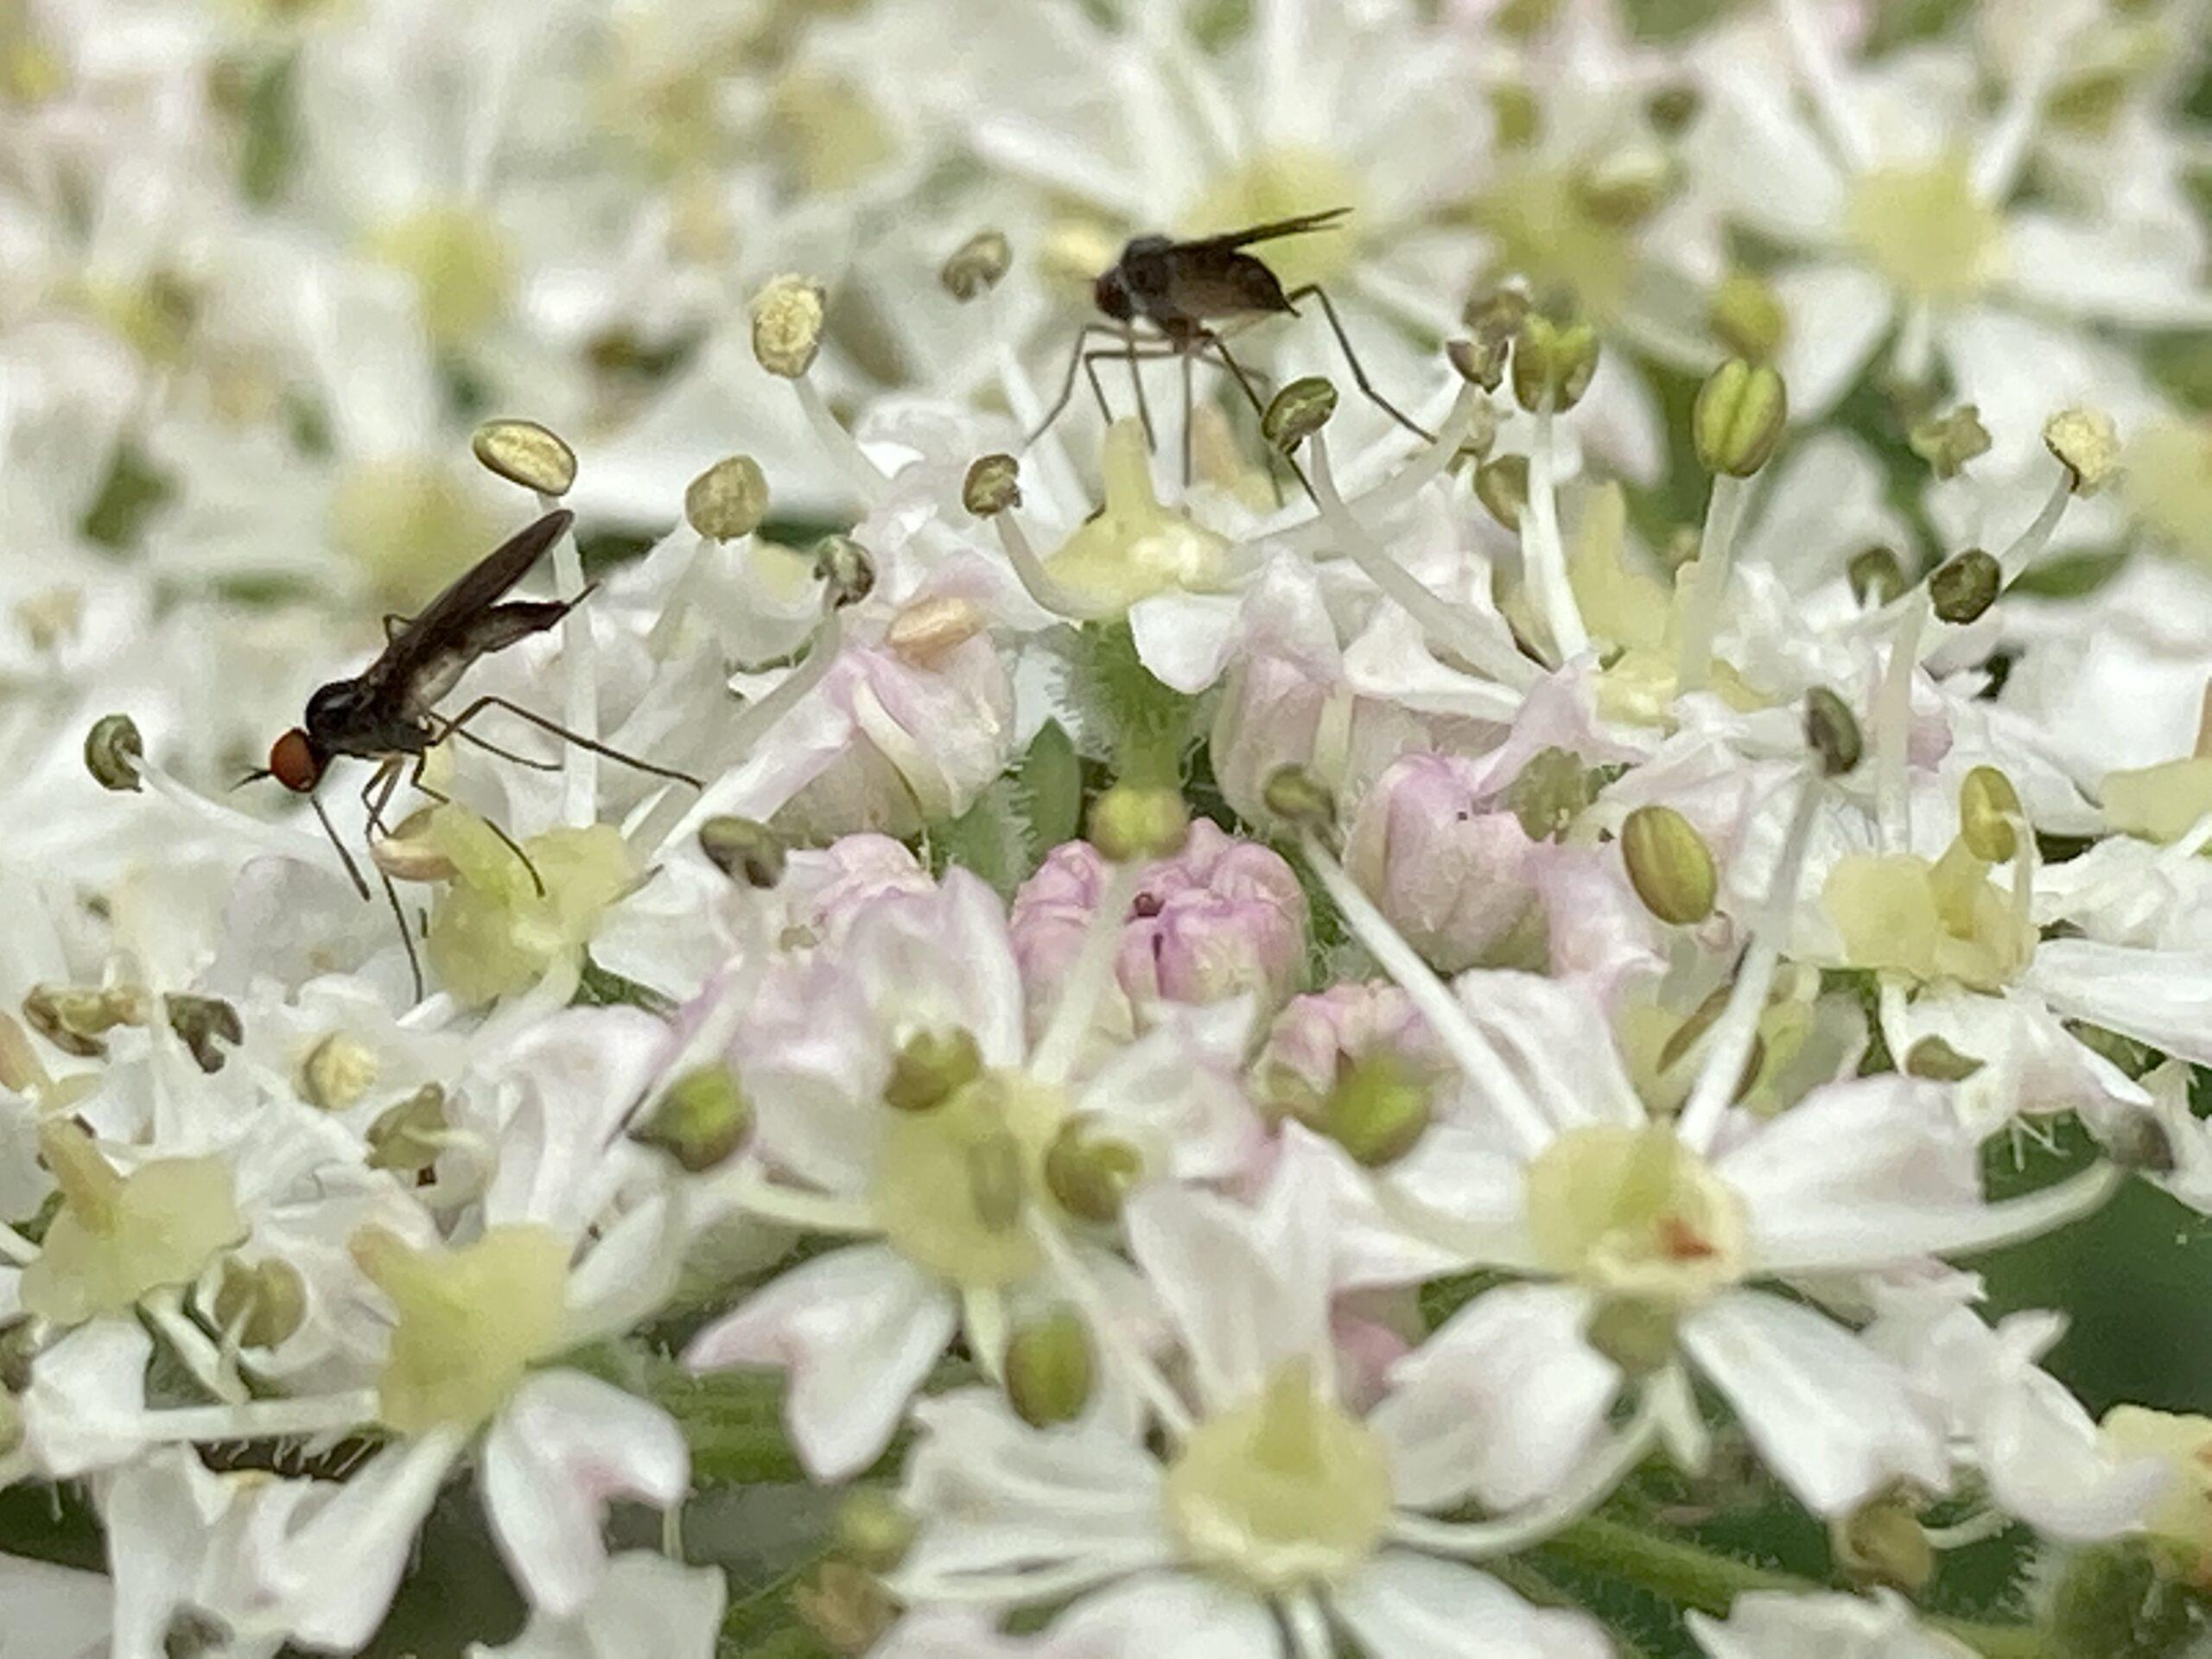 Dance fly - Rhamphomyia sulcata